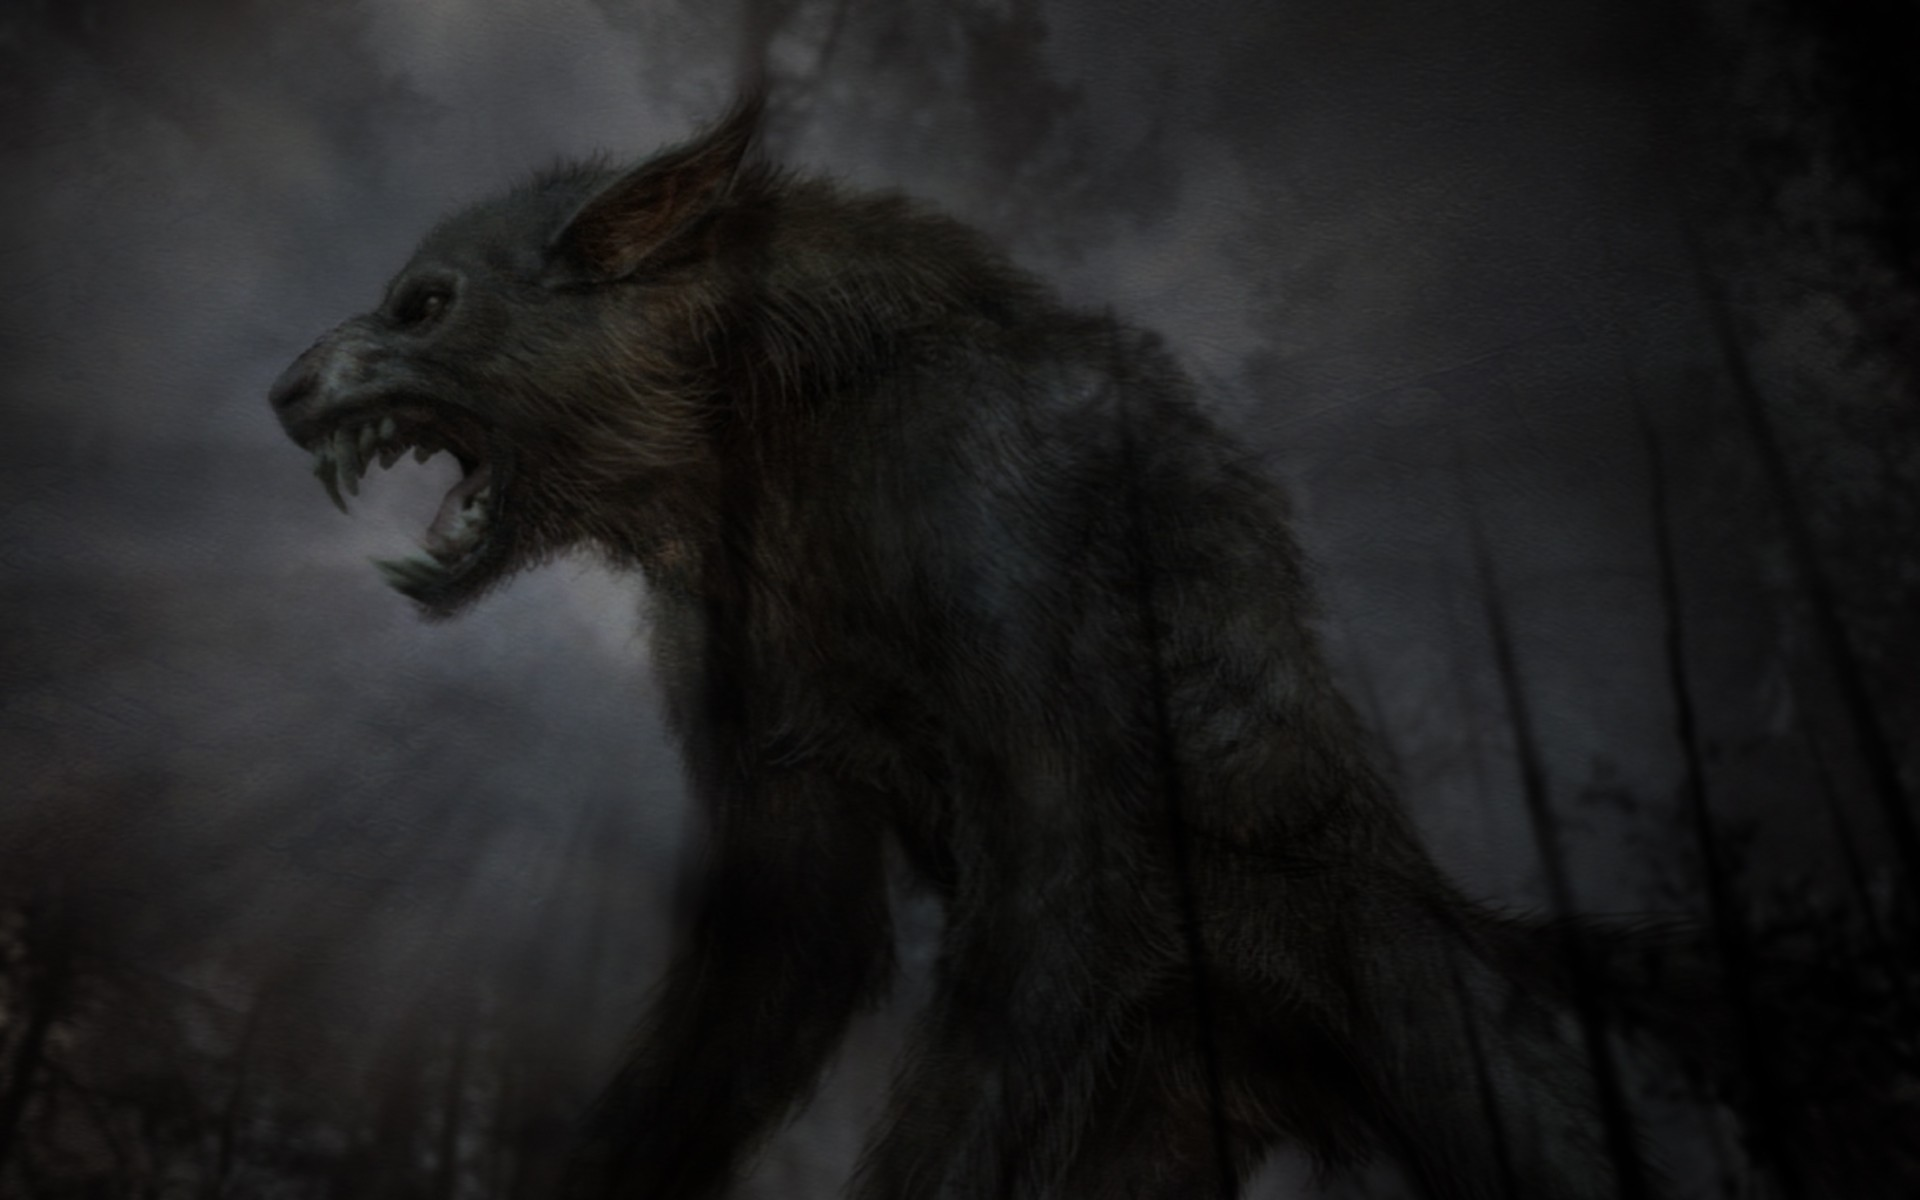 Werewolf wallpaper 3955 1920x1200